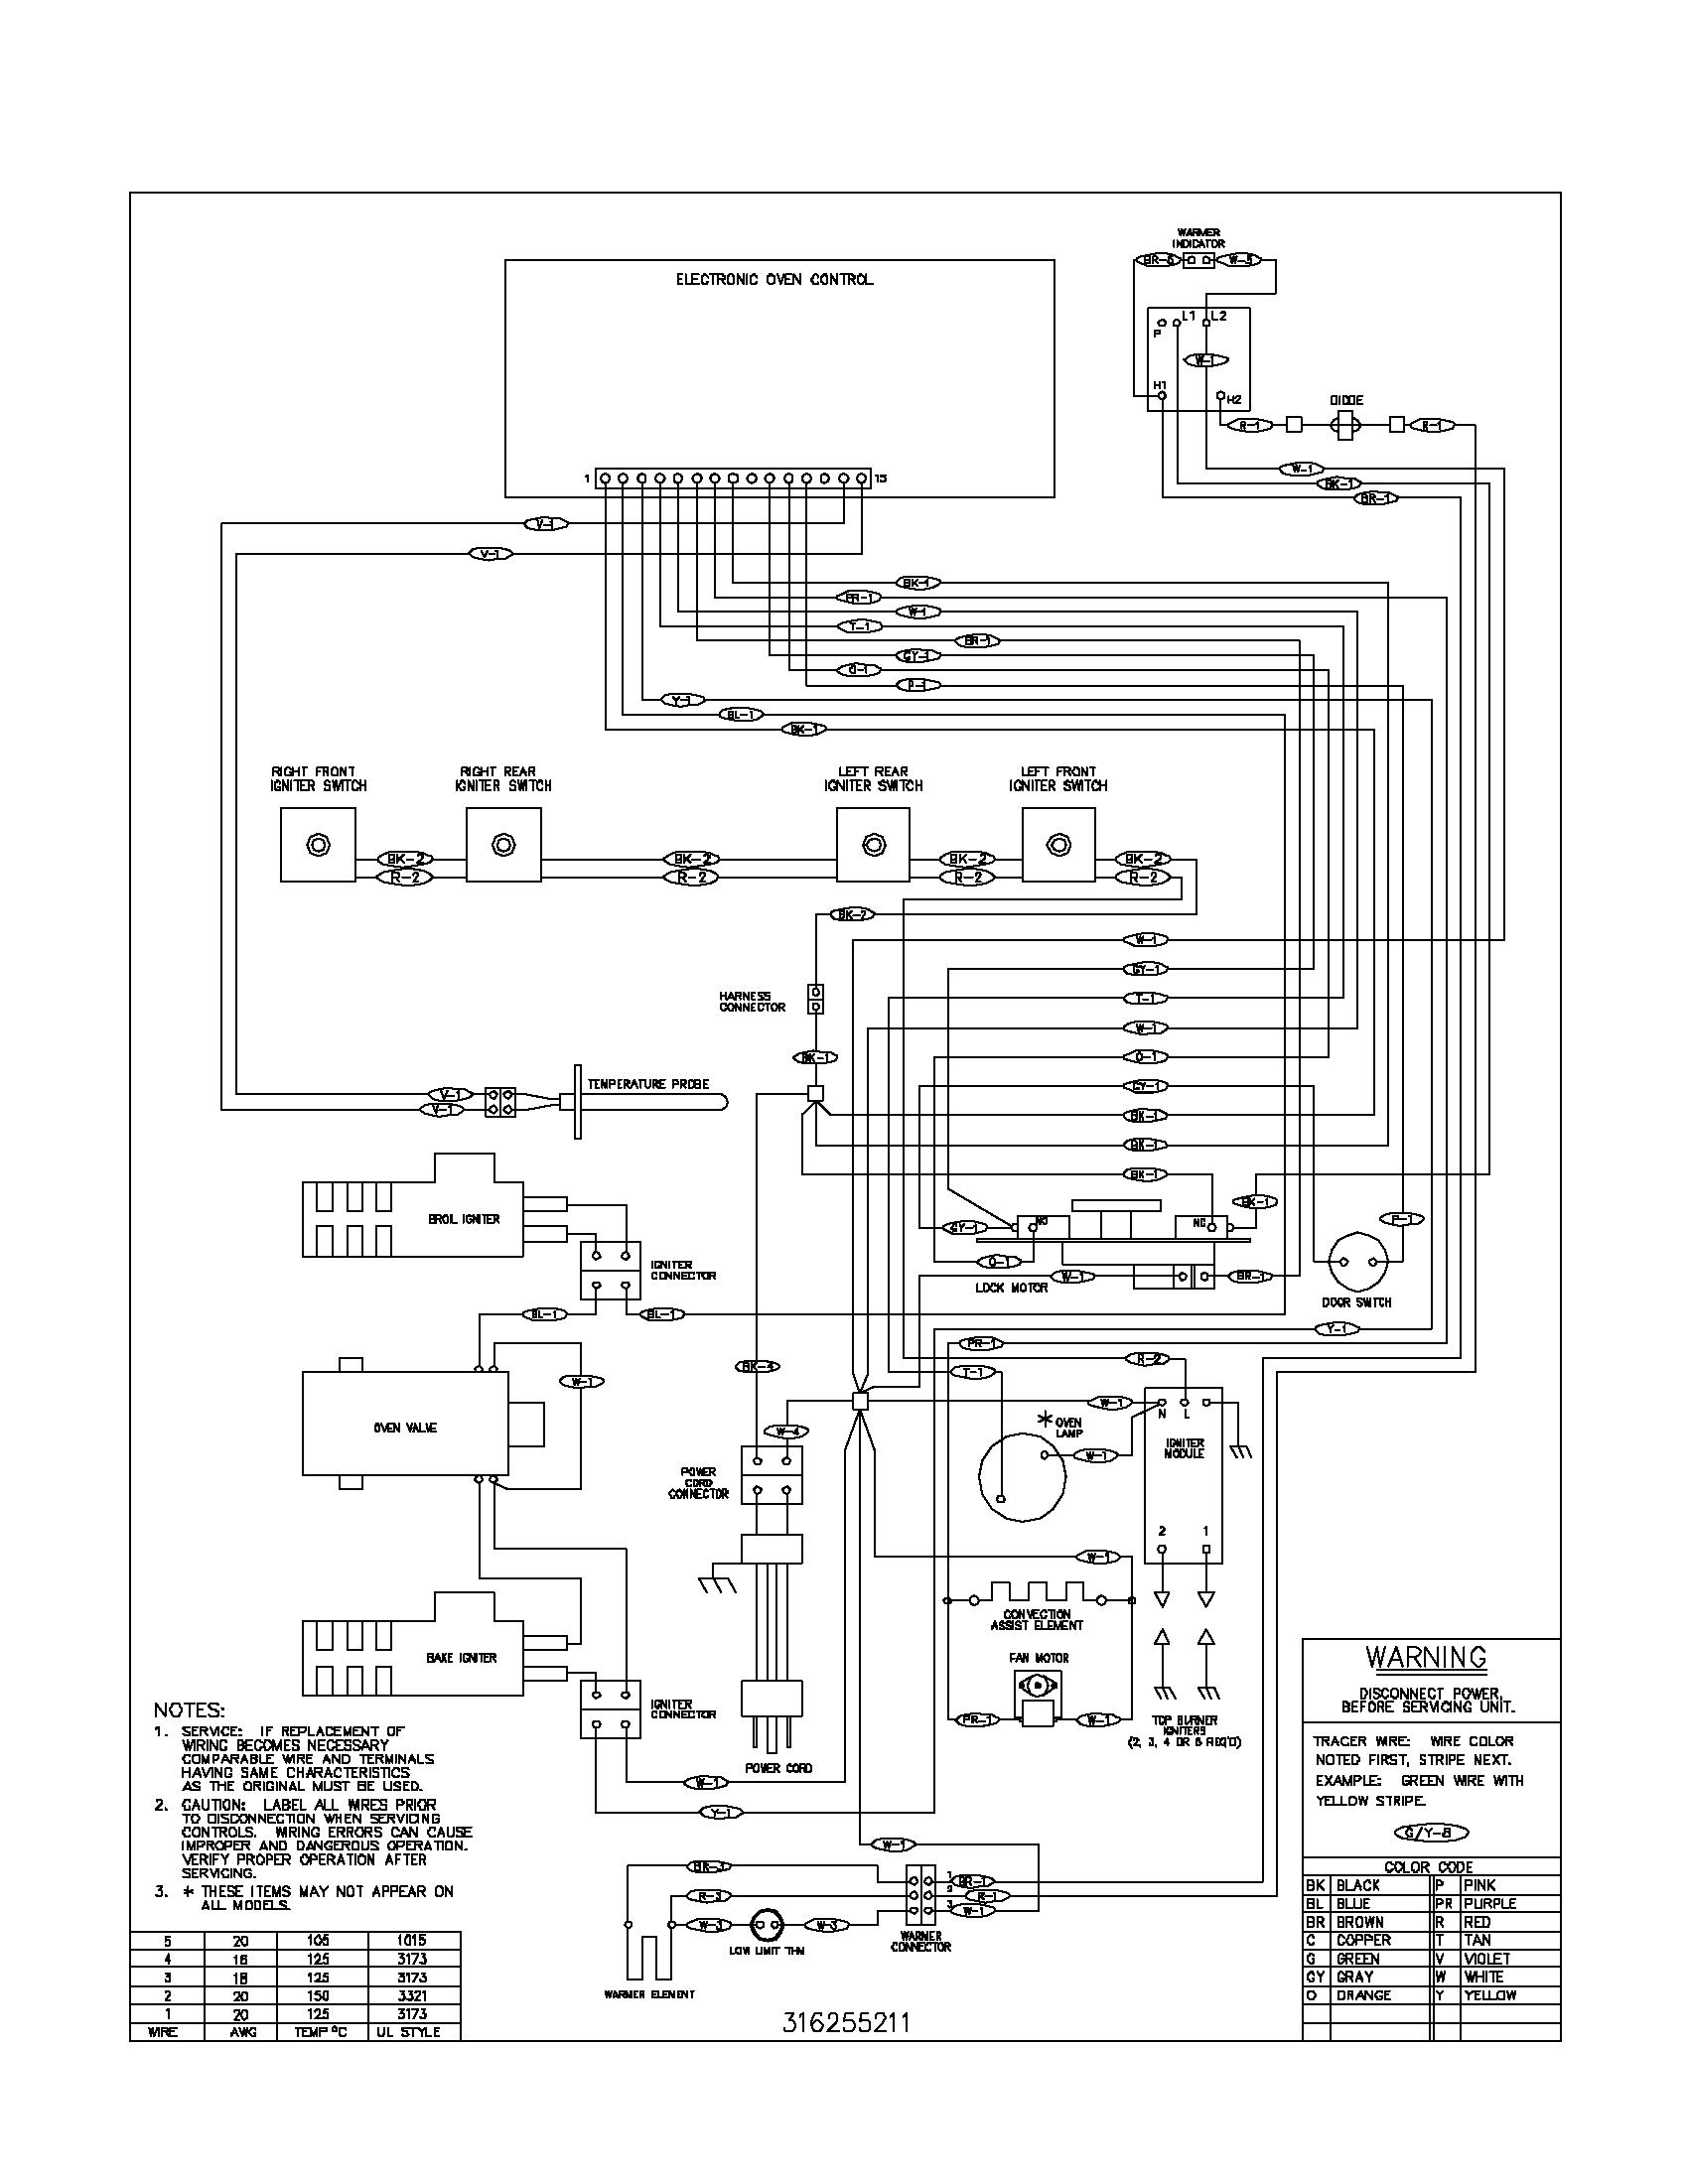 frigidaire wire diagram wiring diagram paperfrigidaire wire diagram wiring diagram centre frigidaire dryer wire diagram frigidaire